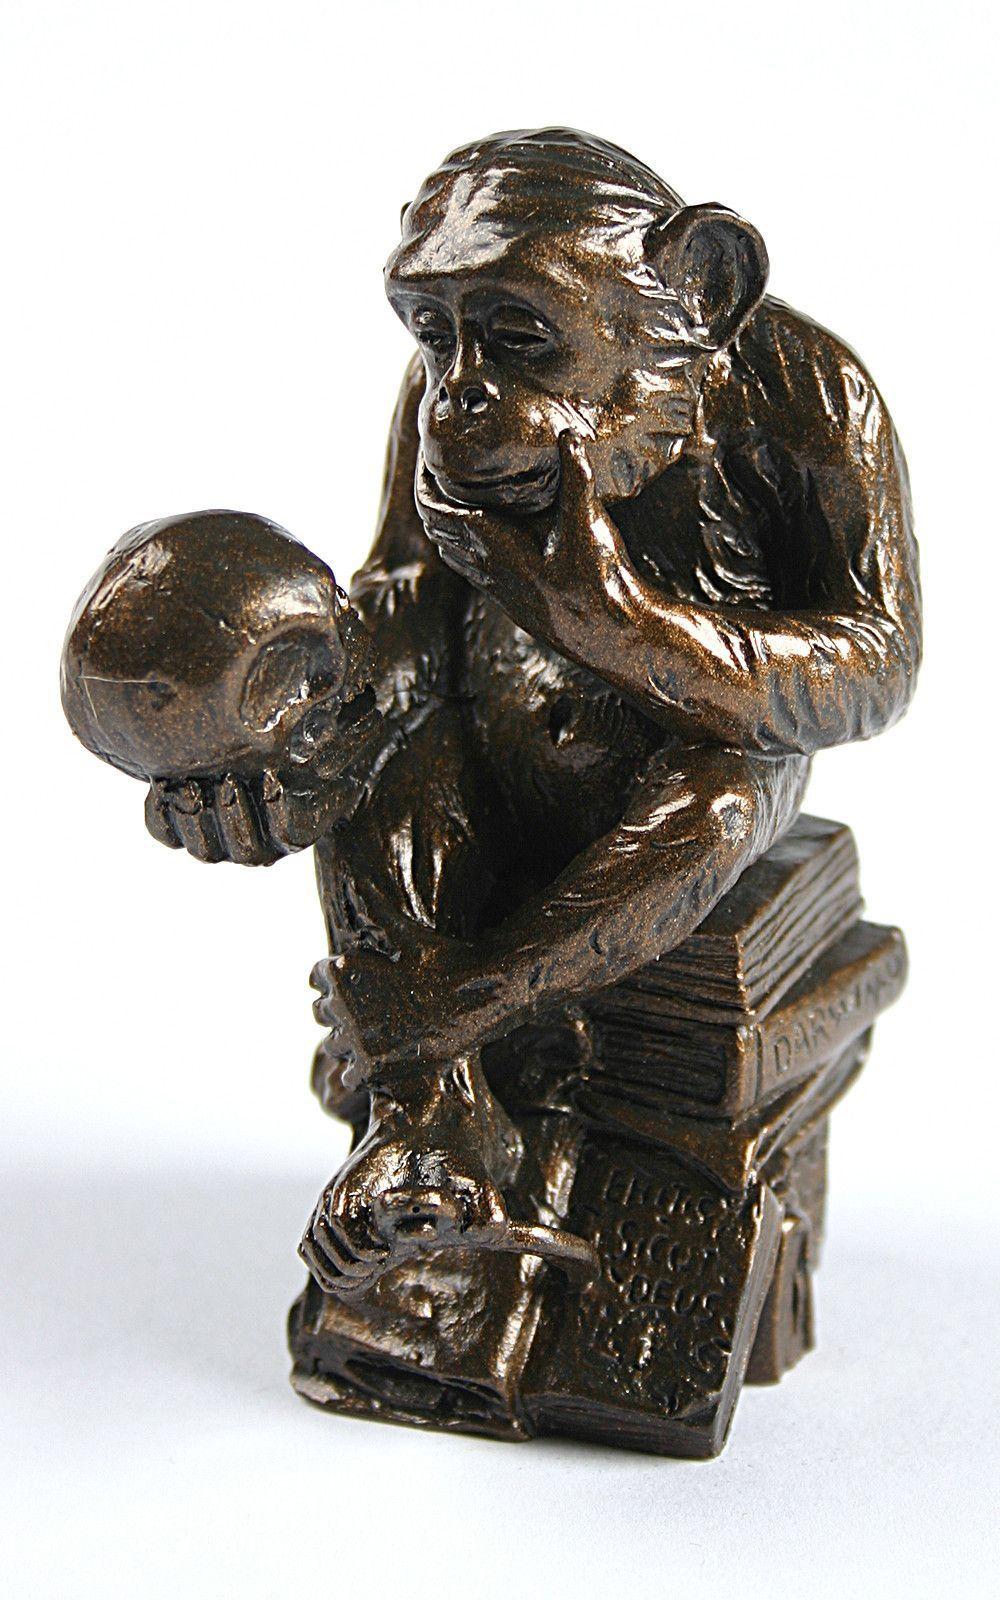 Rost Skulptur Garten Elegant Pocket Art Rheinhold Monkey with Skull Philosophizing